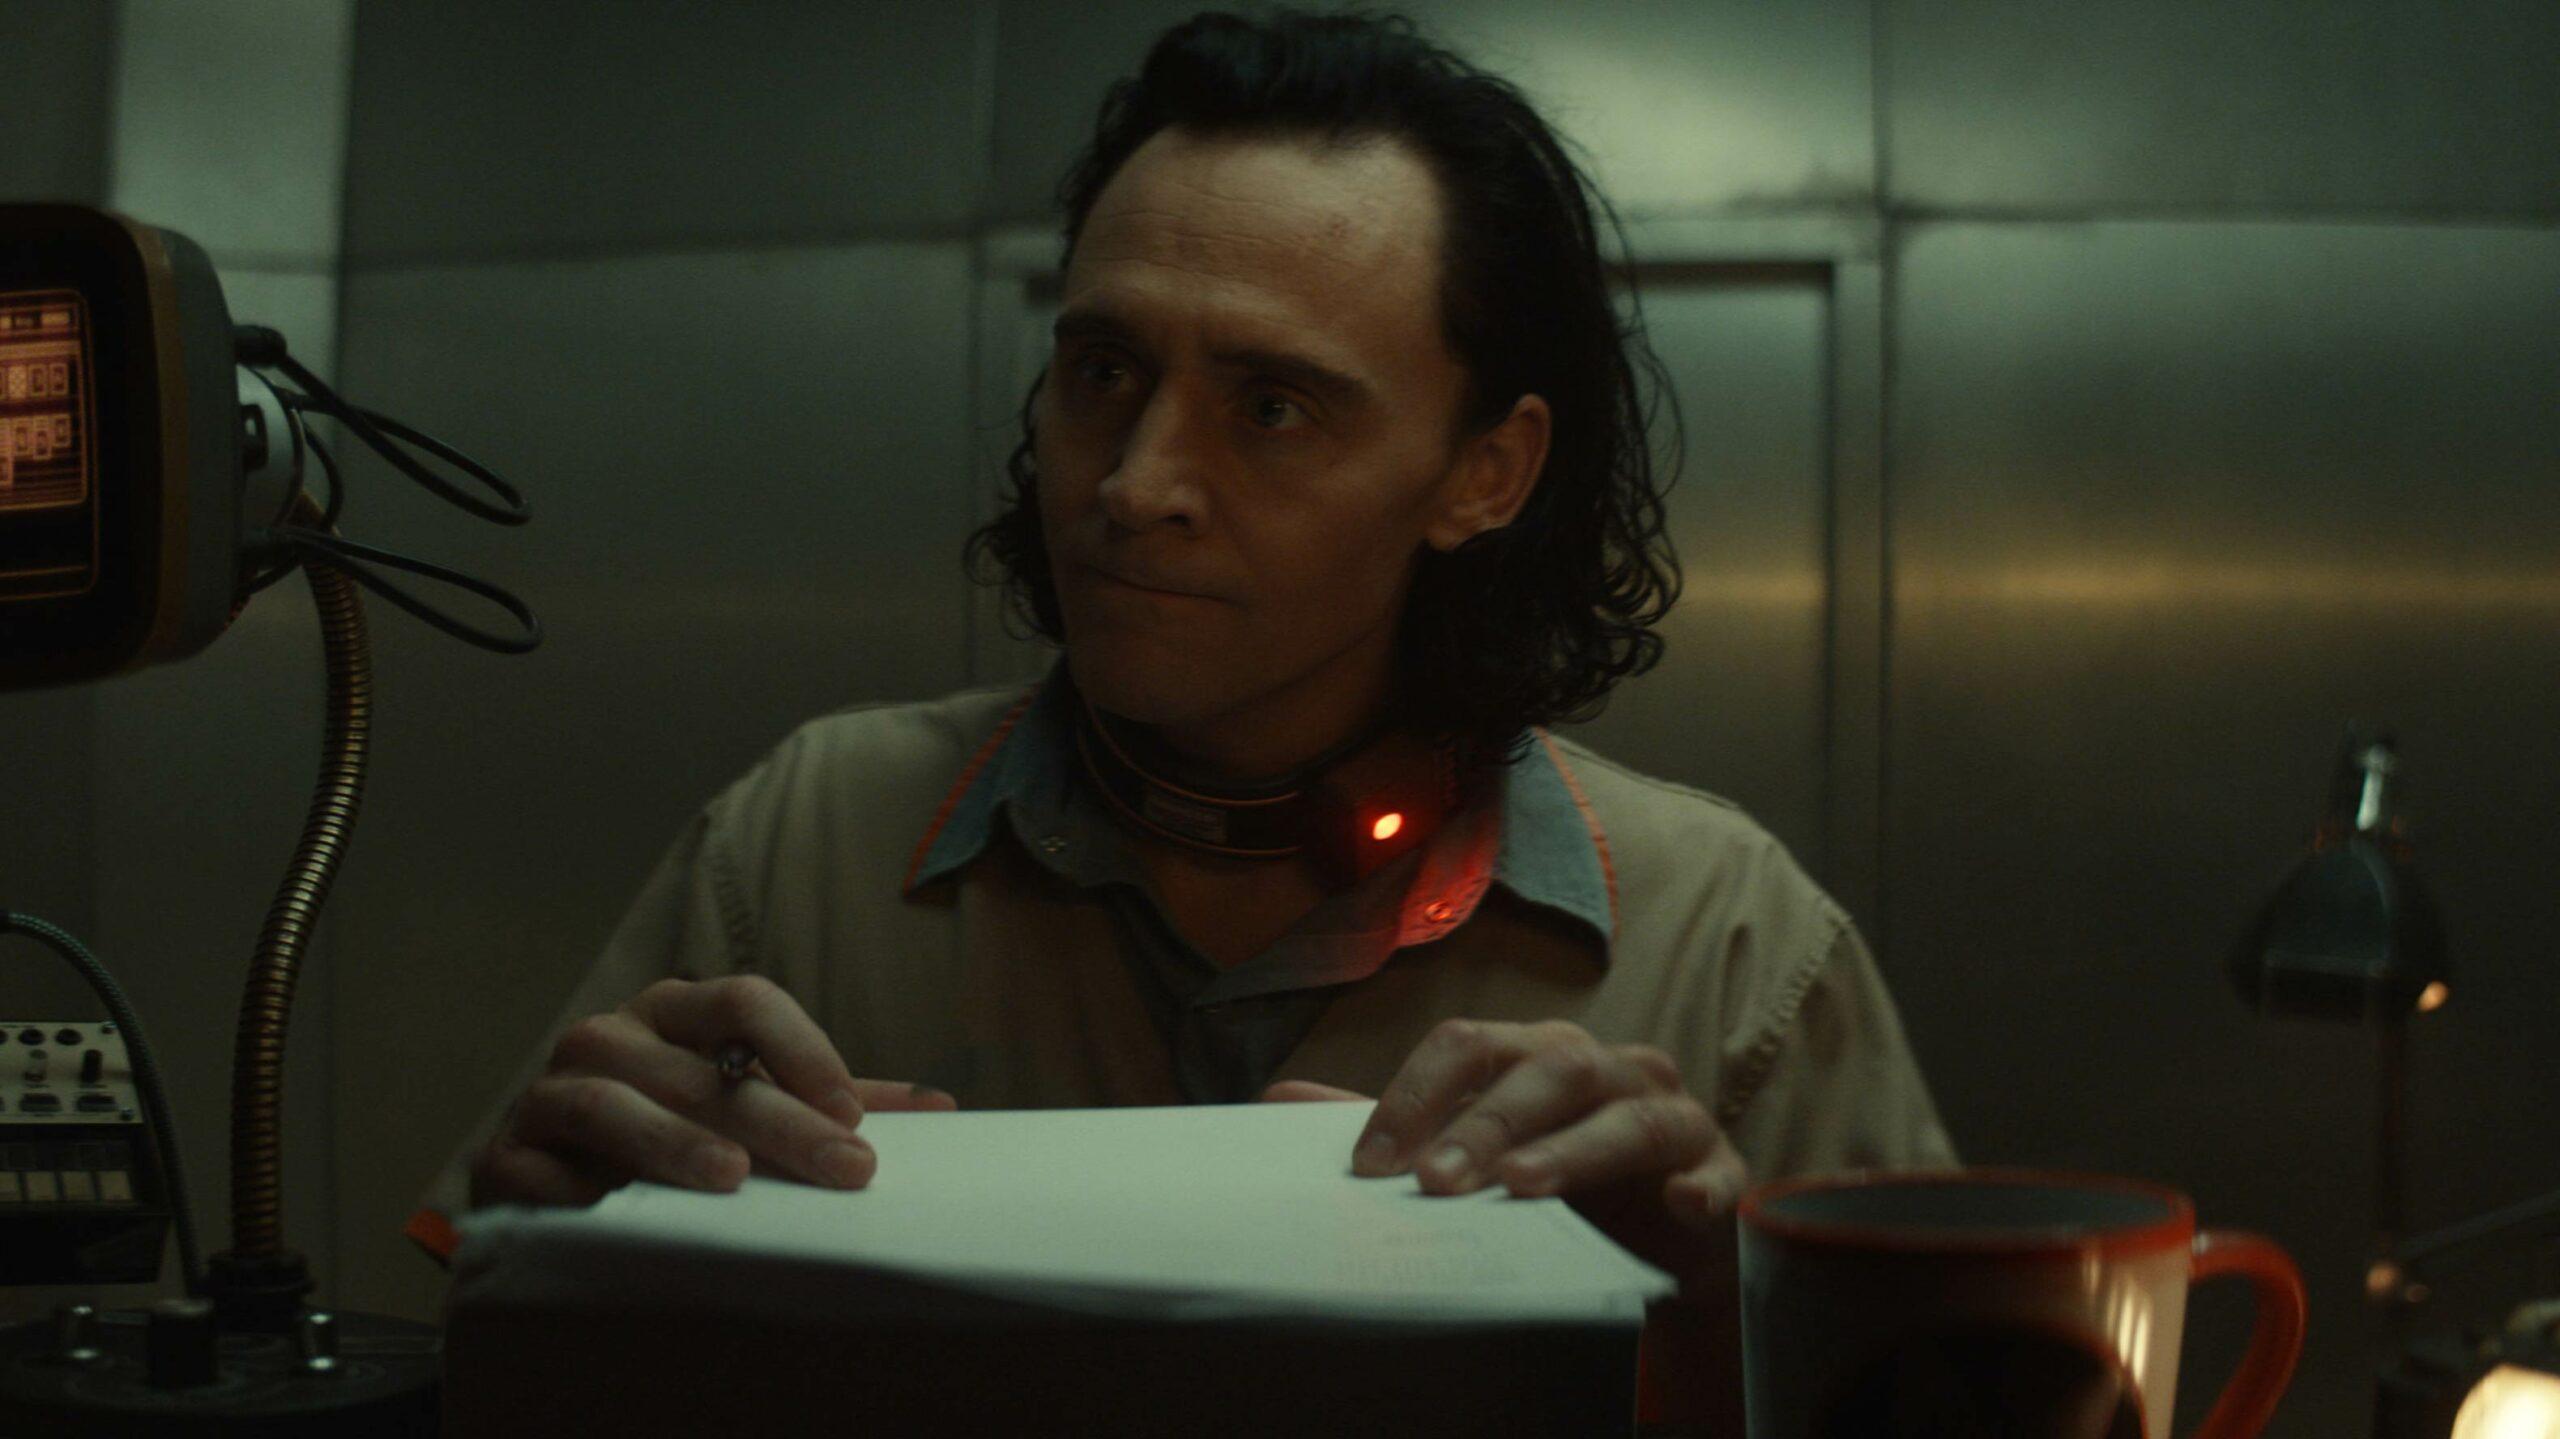 Tom Hiddleston as Marvel's Loki